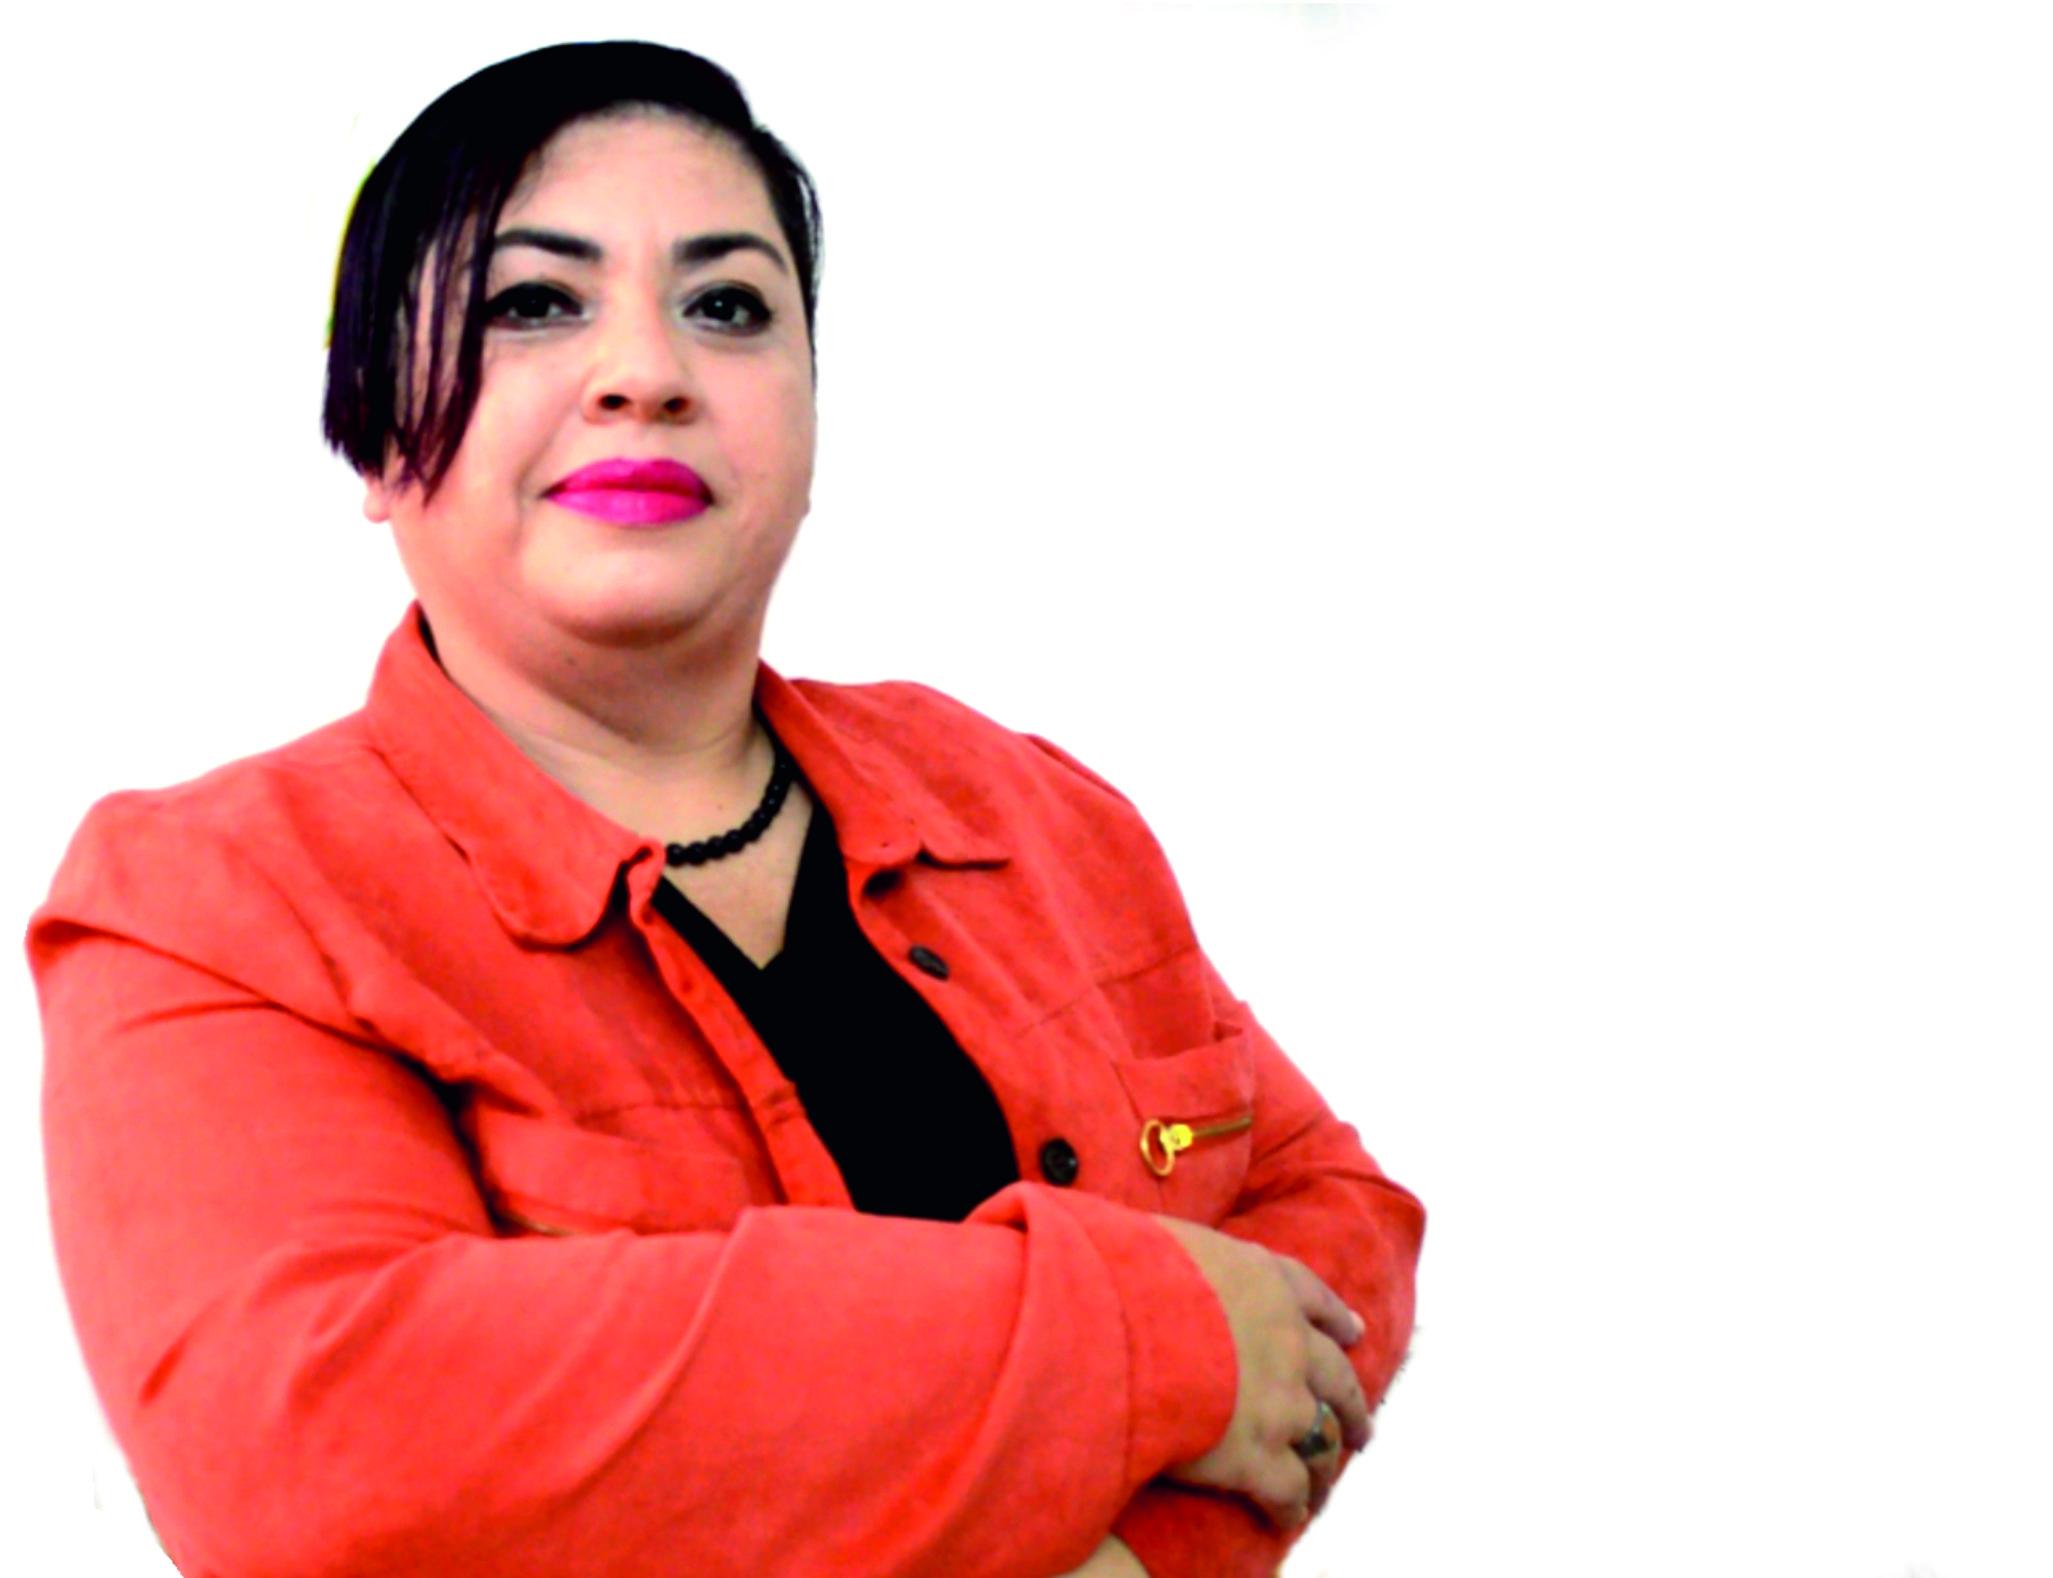 DRA. MAYRA CASTAÑEDA